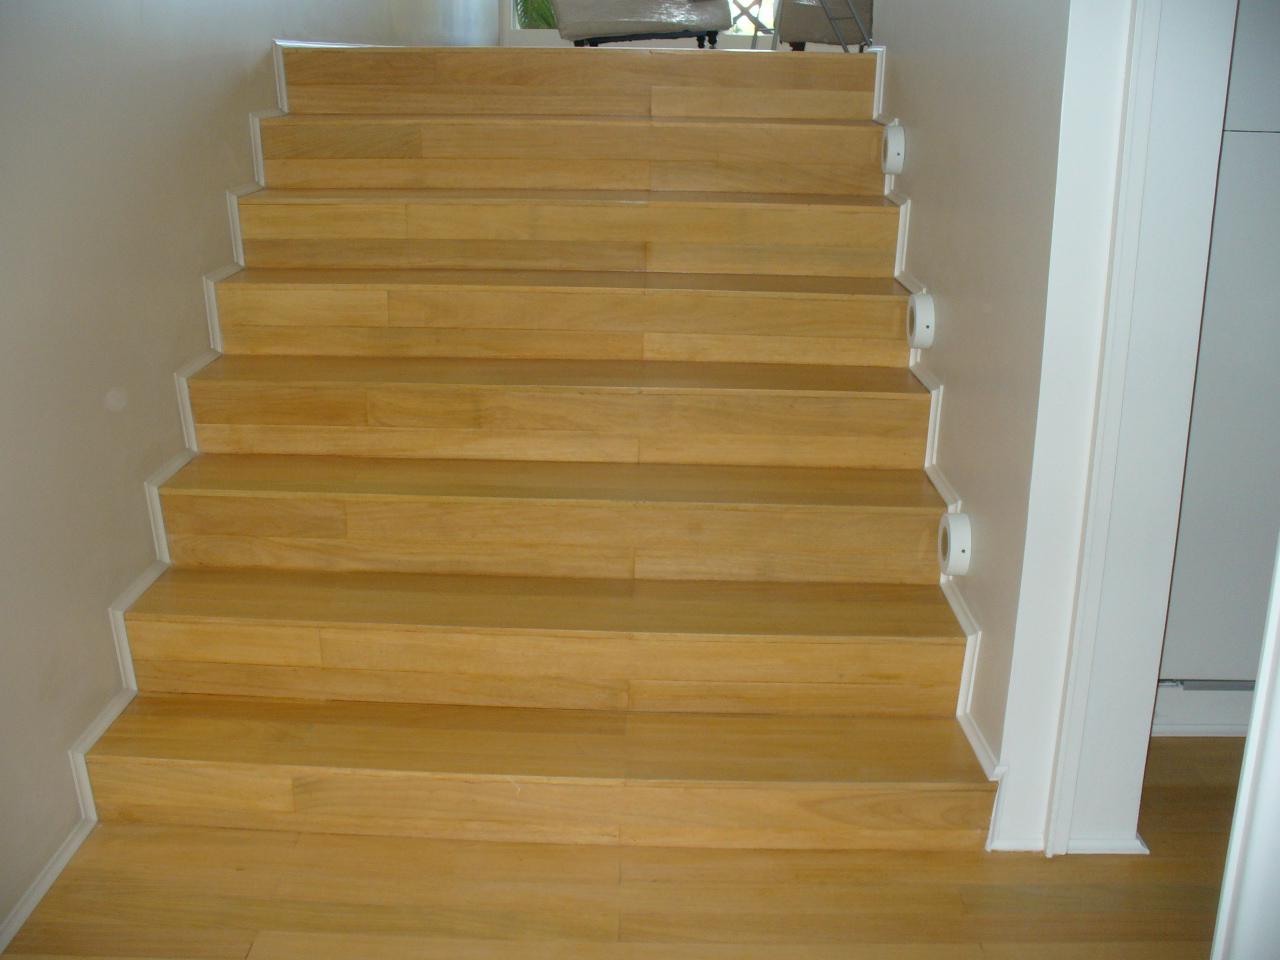 Escaleras interiores - Escaleras interiores de obra ...